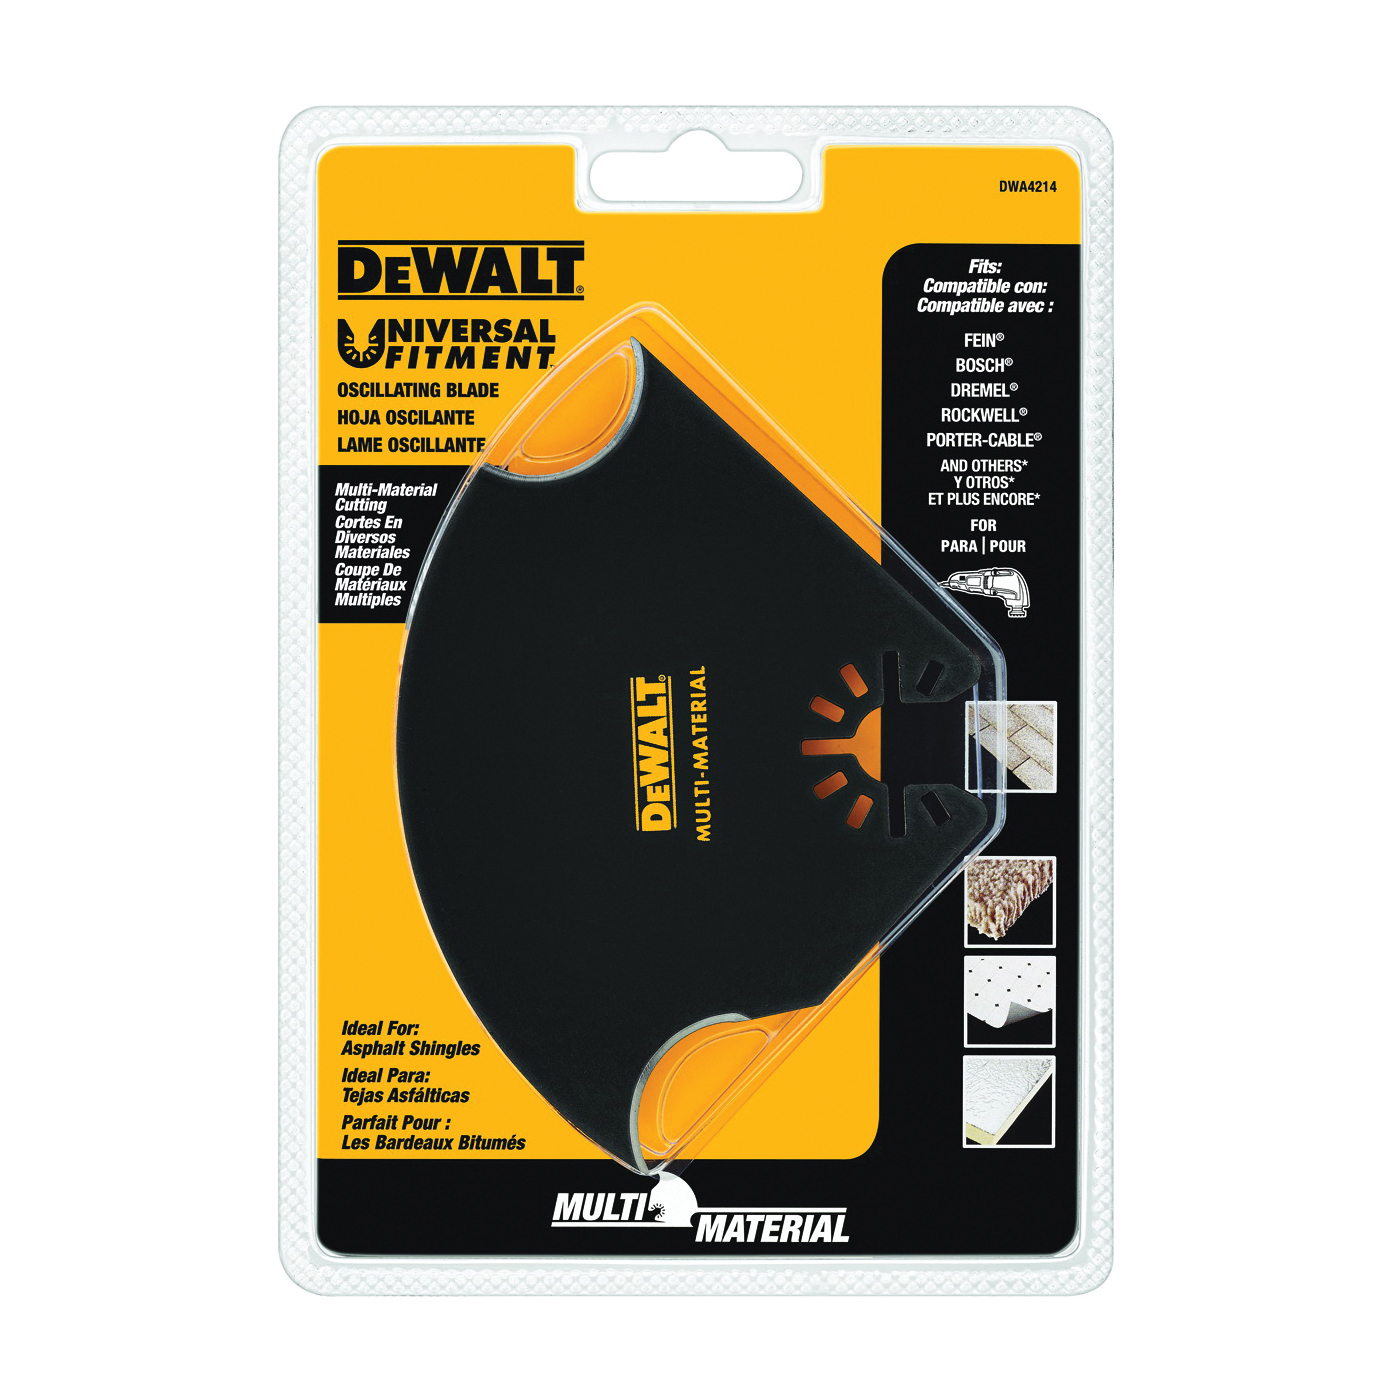 DeWALT DWA4214